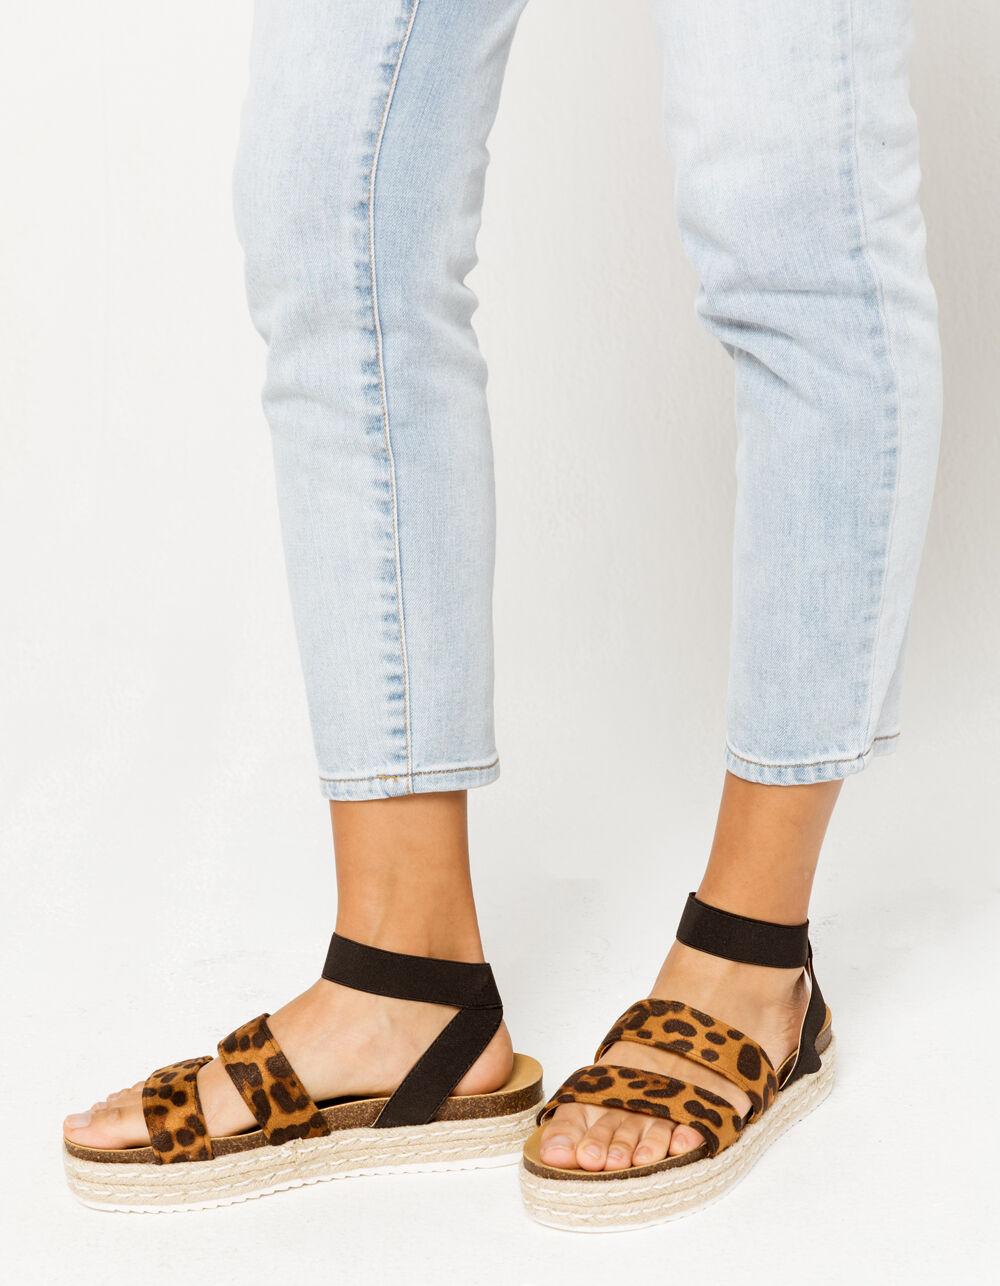 YOKI Chiara Leopard Espadrille Flatform Sandals